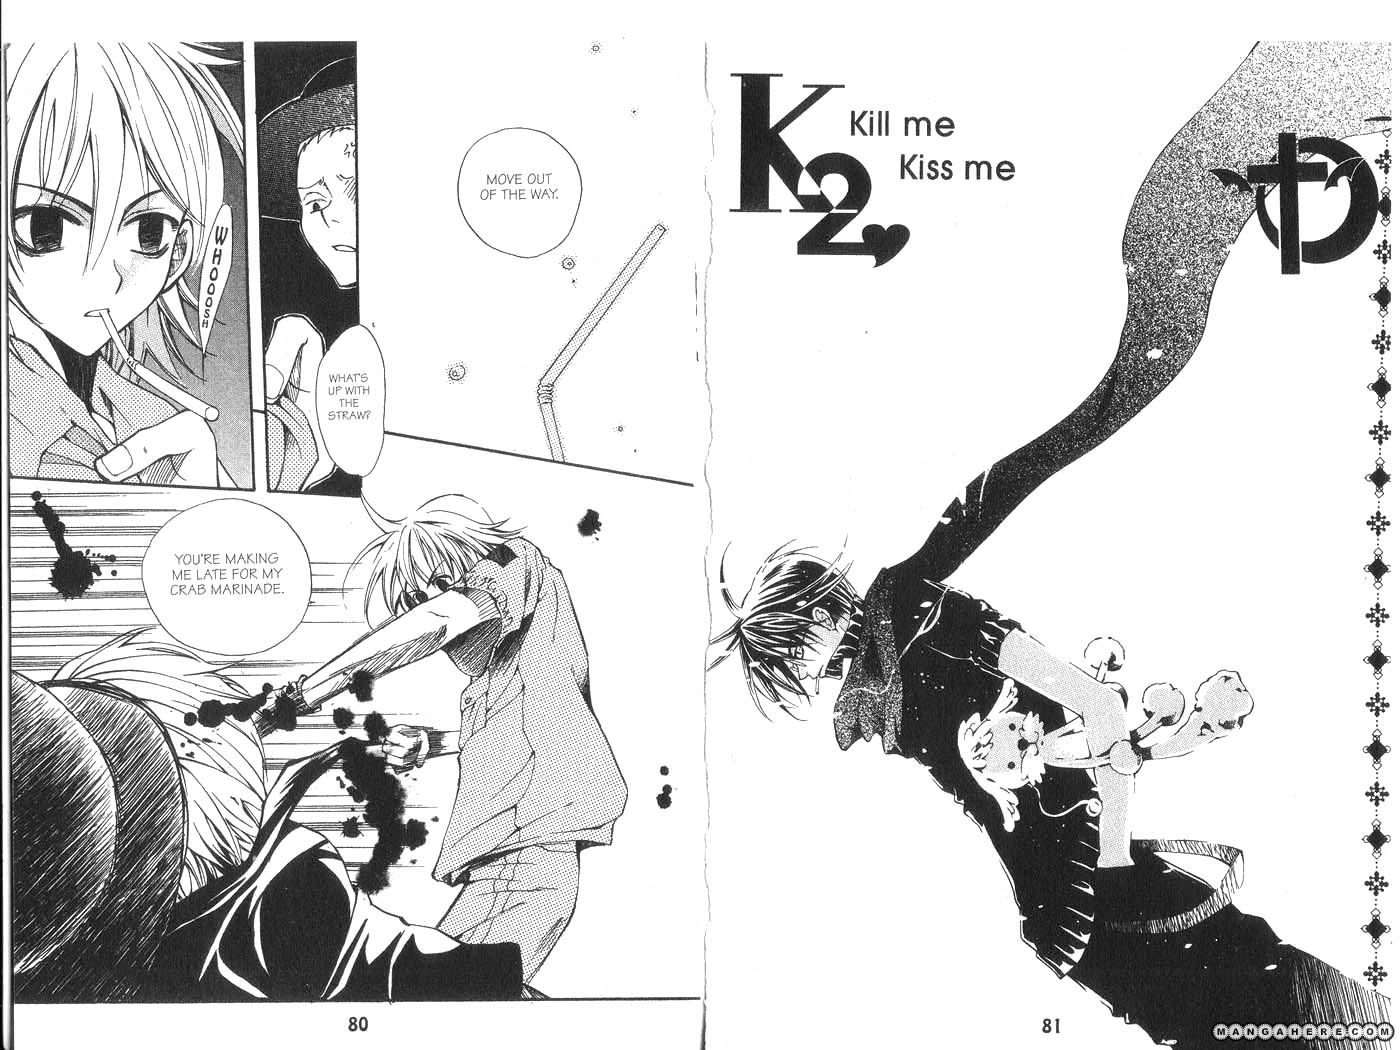 Kill Me Kiss Me 10 Page 1